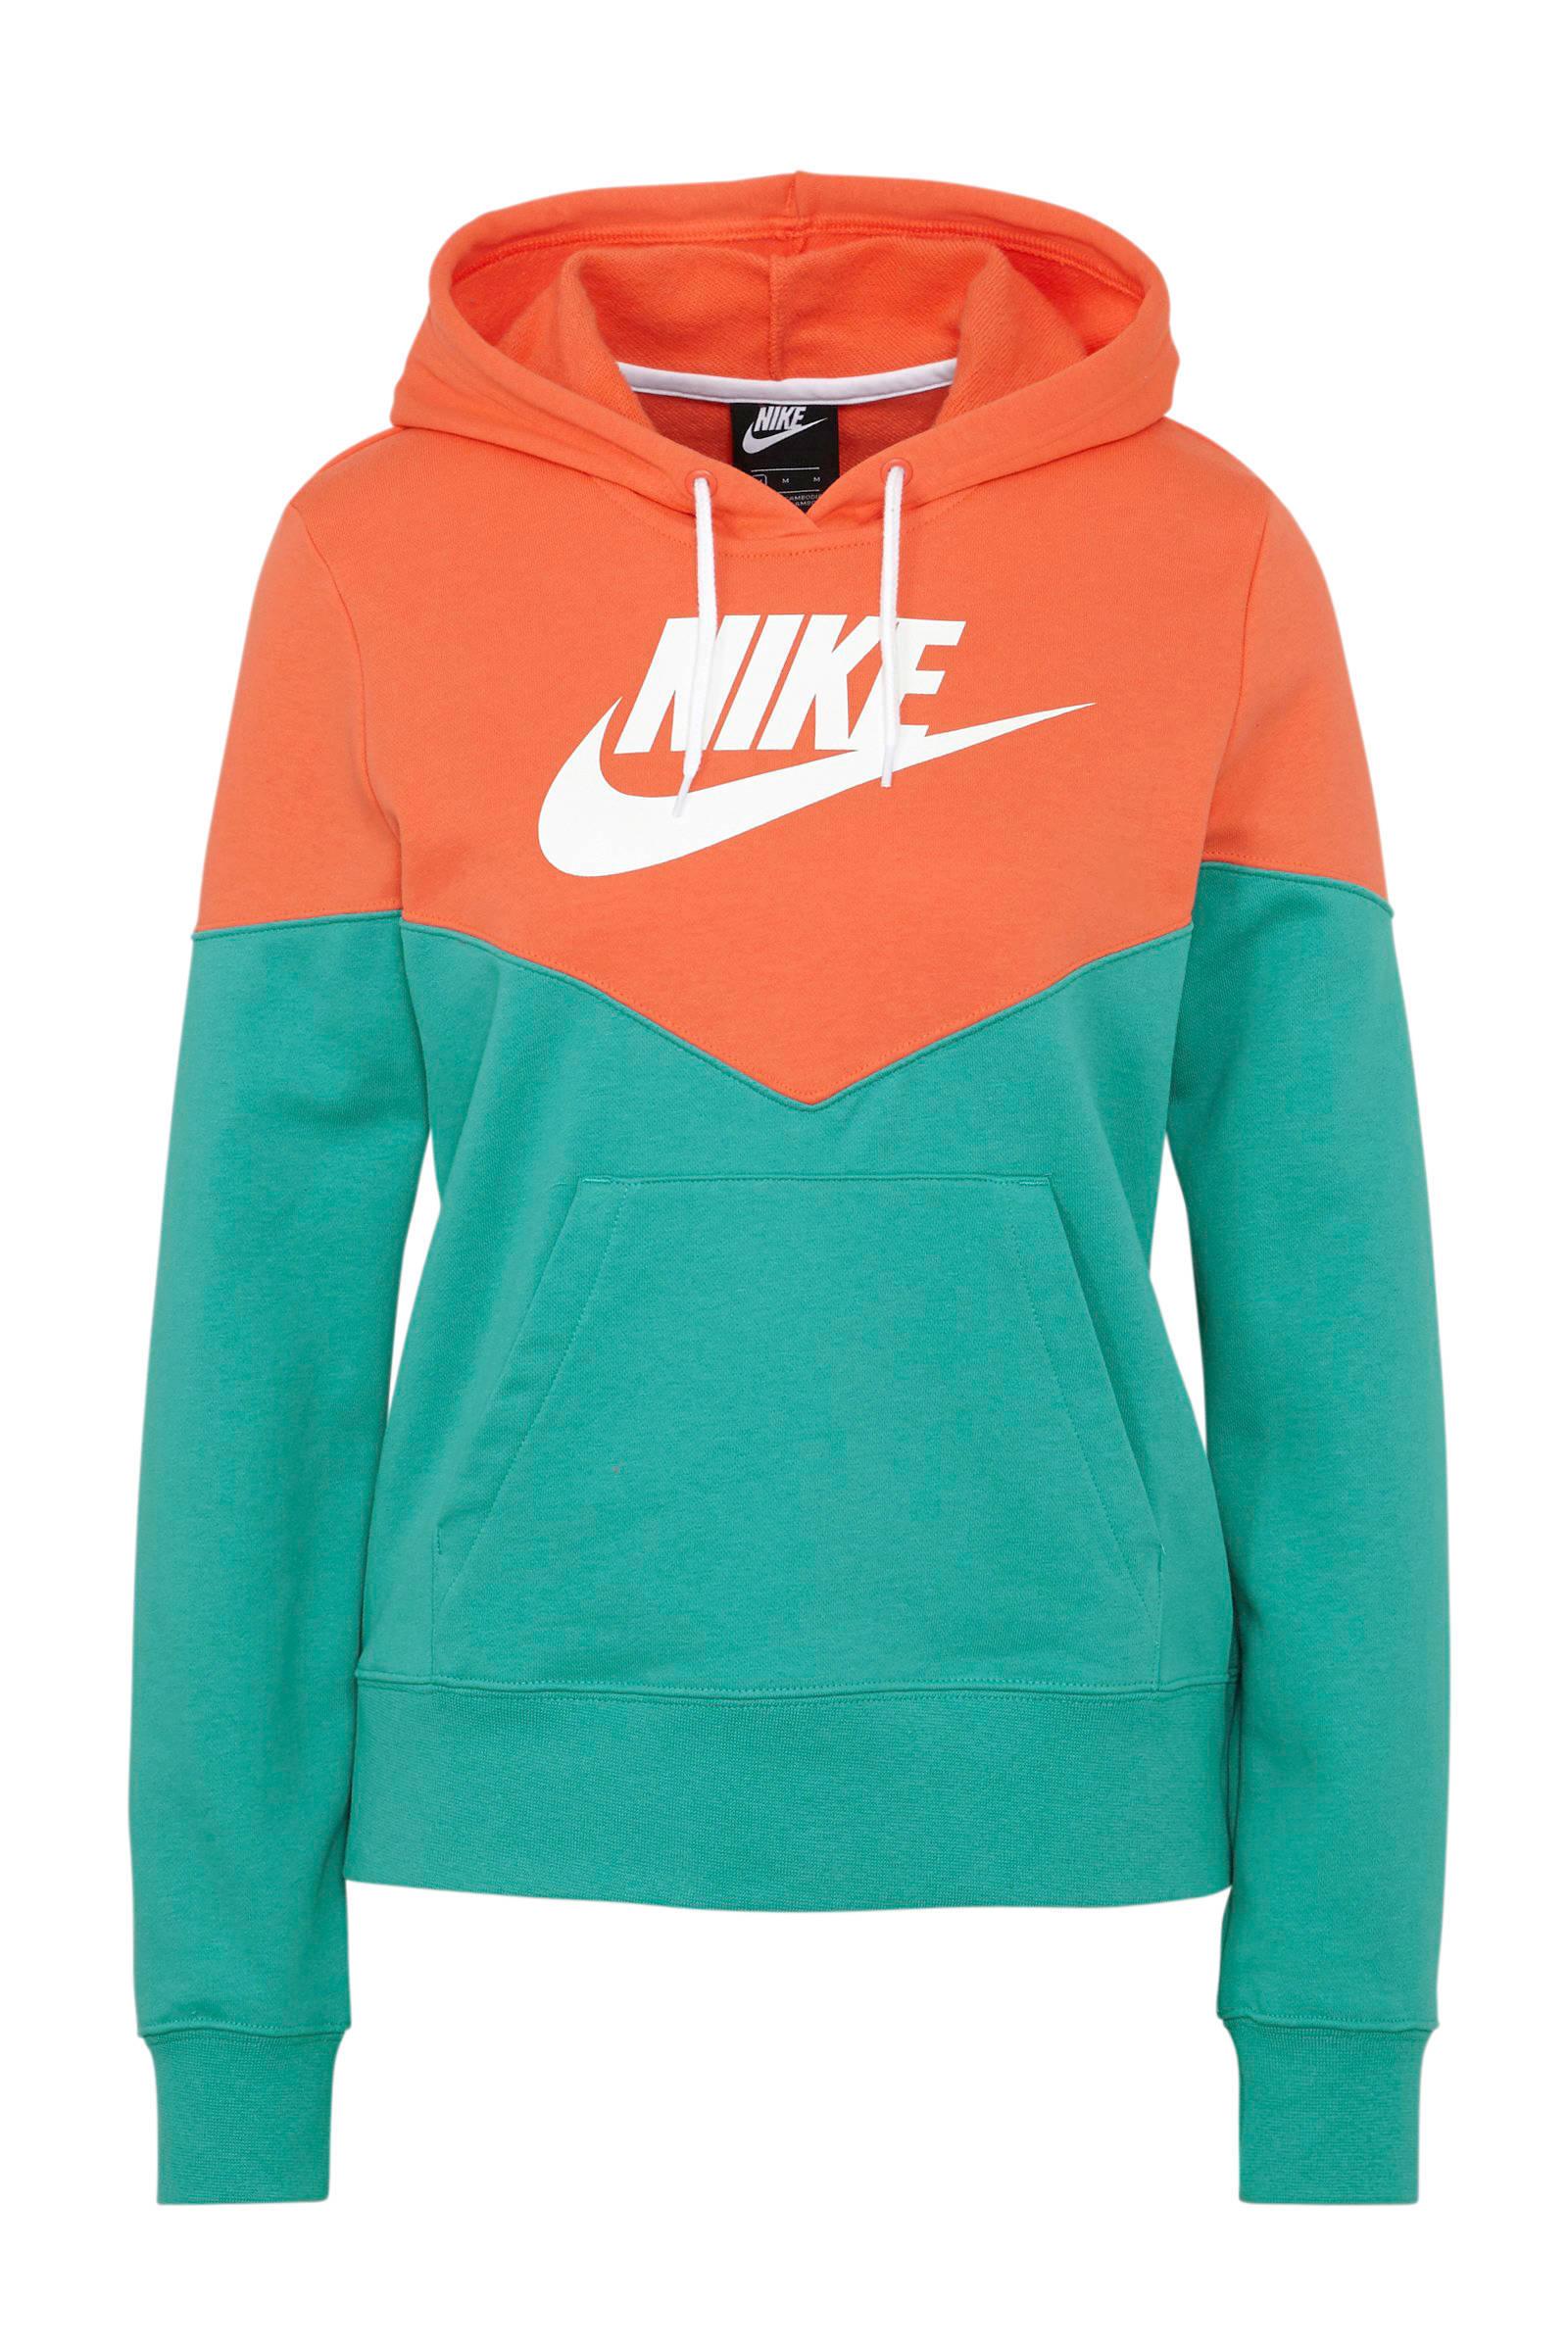 2c396b48c13f Nike Lifestyle bij wehkamp - Gratis bezorging vanaf 20.-